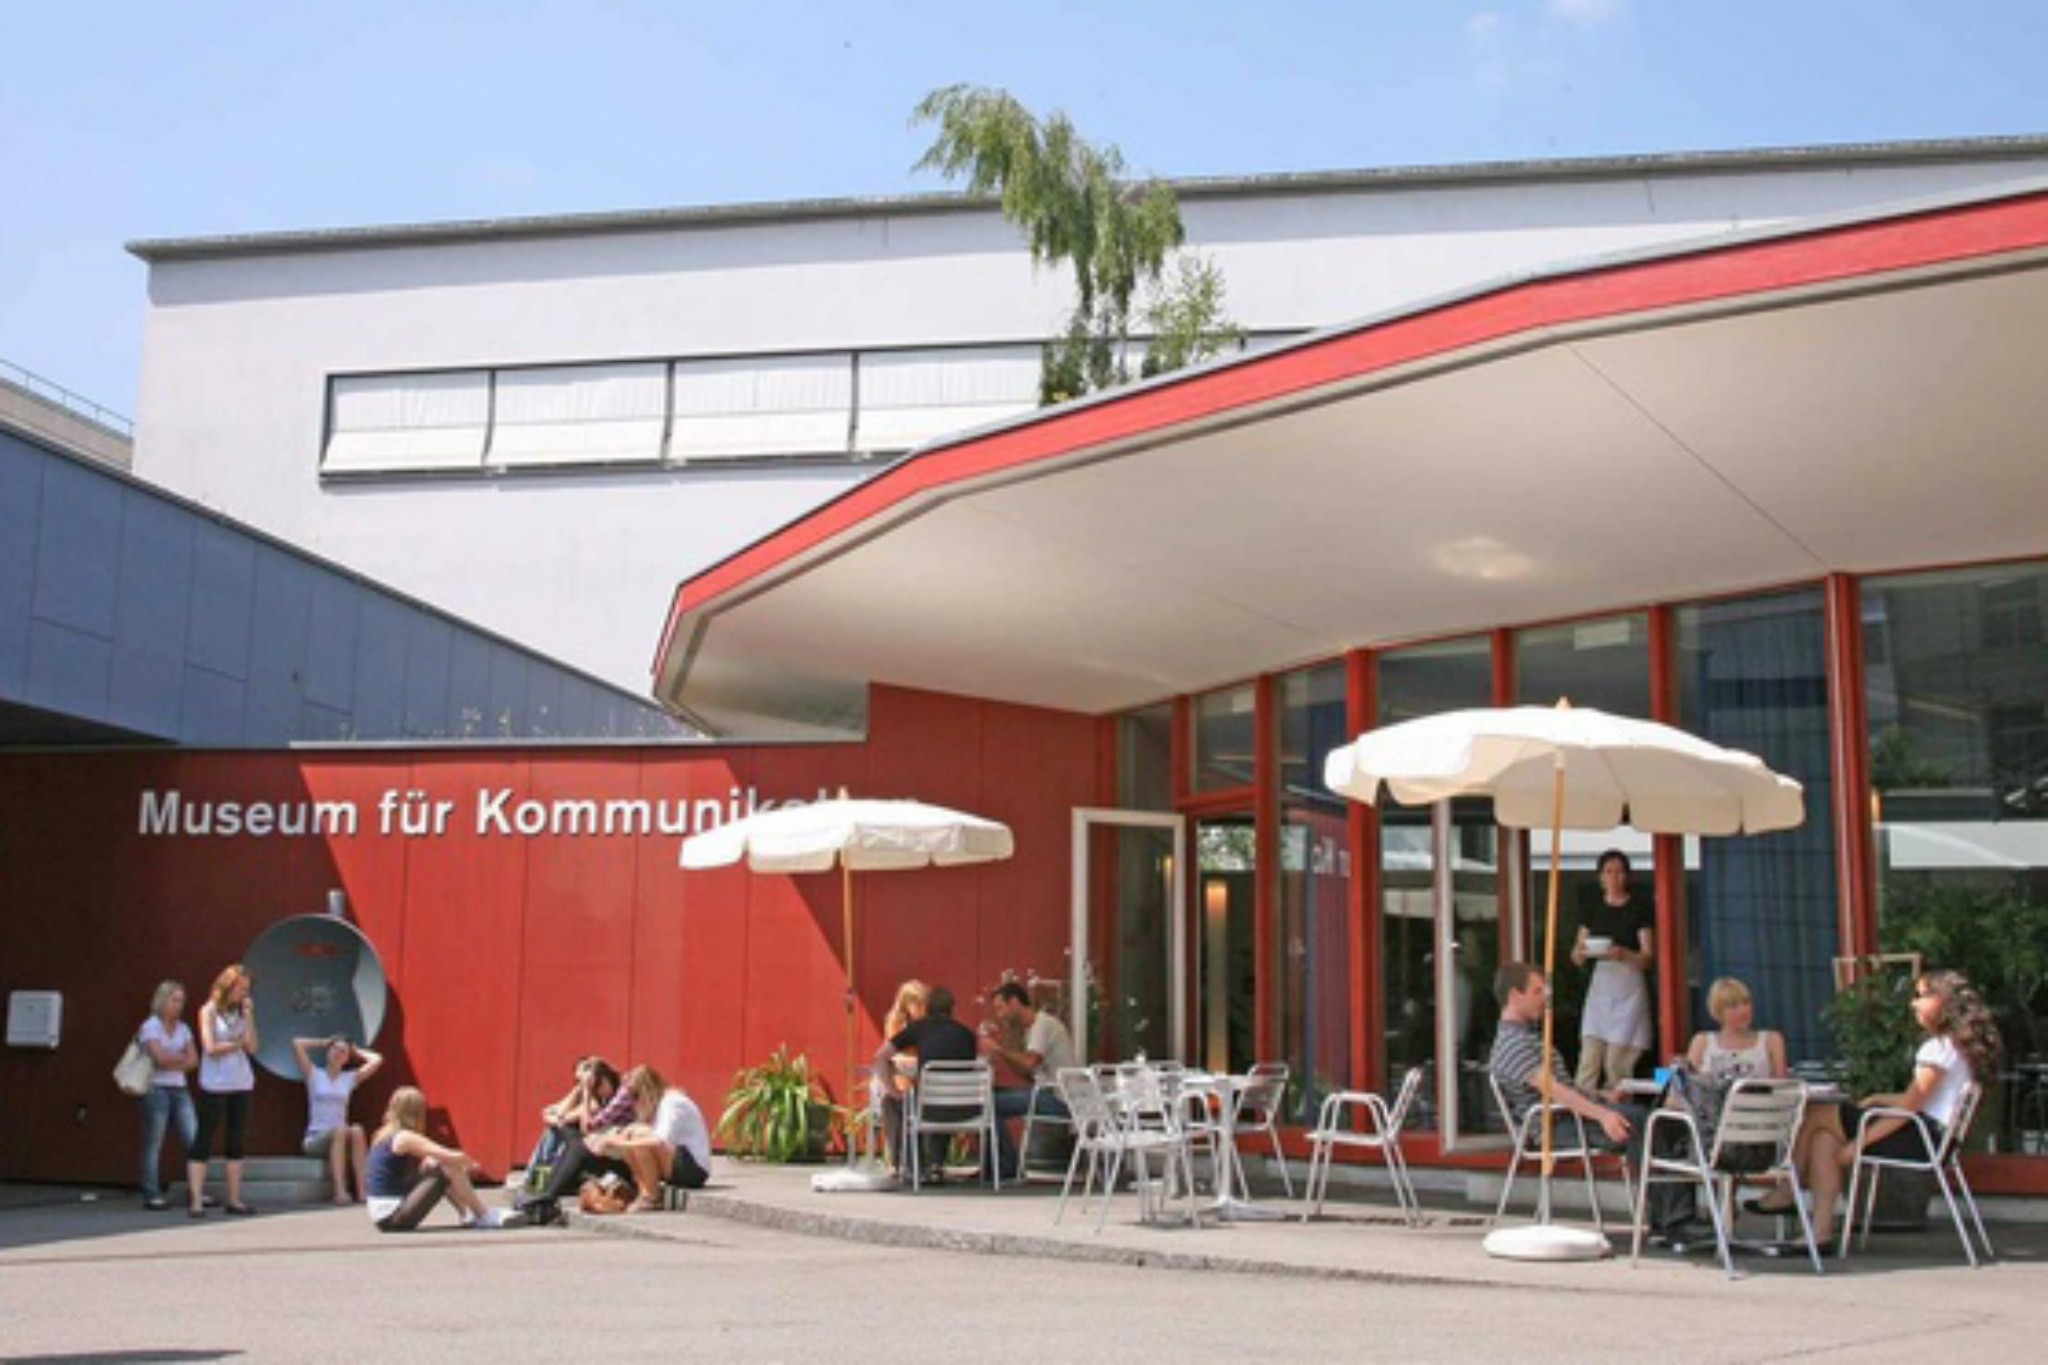 Museum of Communication • Bern